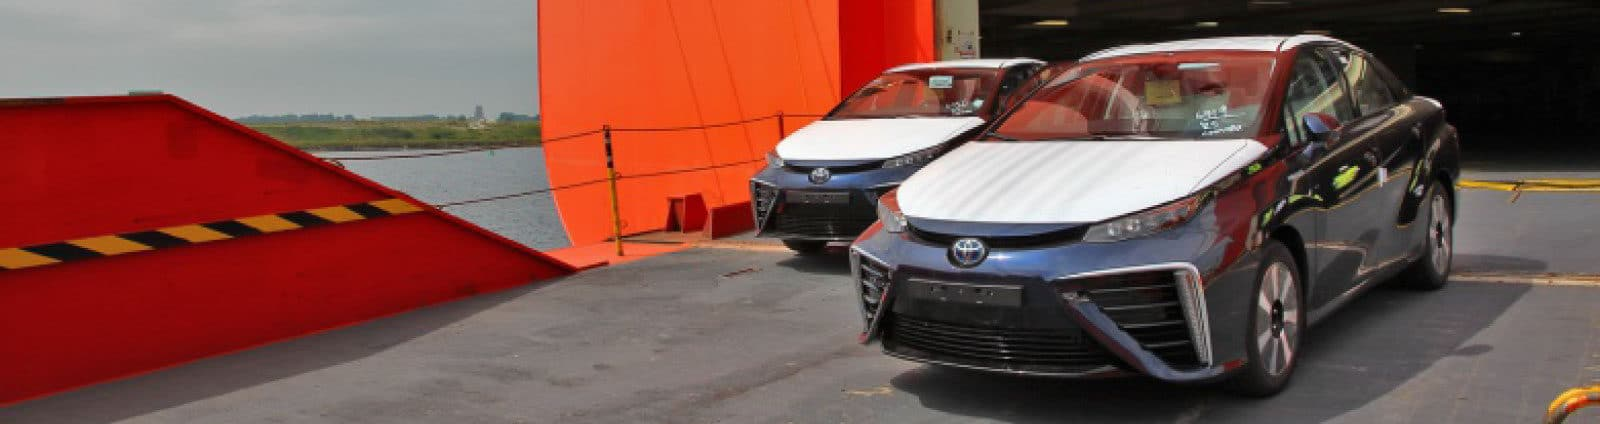 Car Insurance Imports Australia